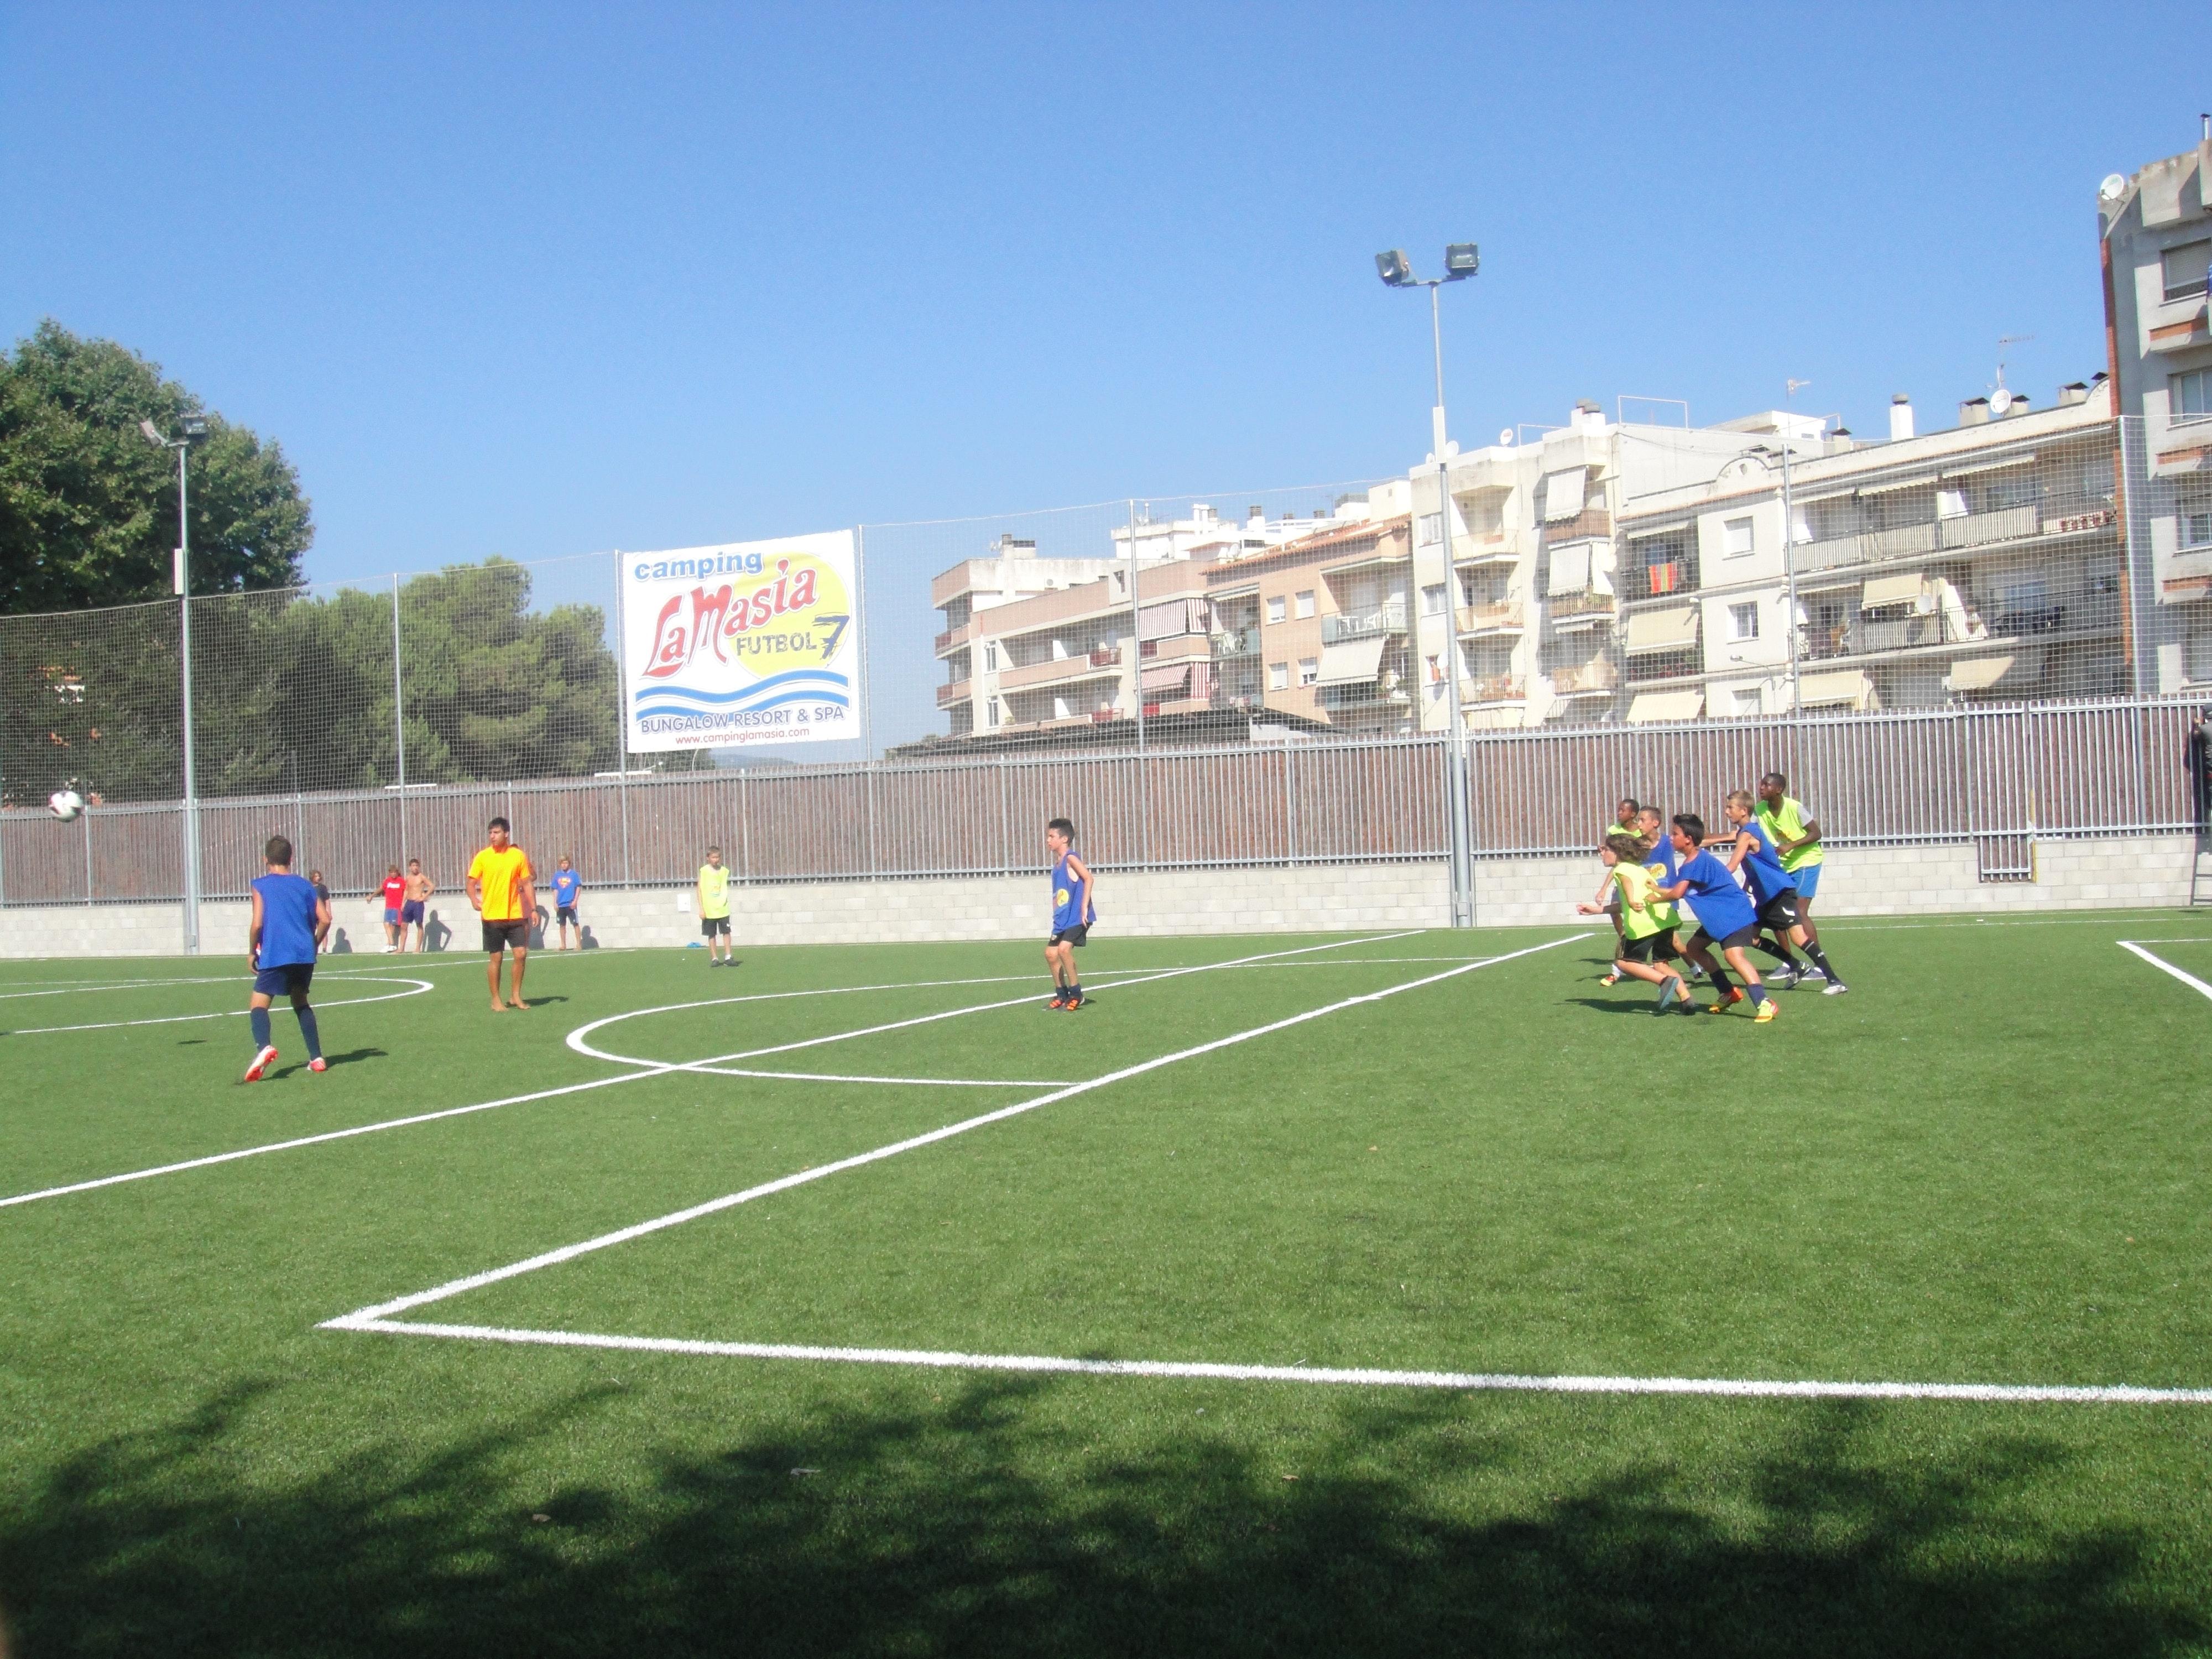 Camping La Masia kunstgras voetbalveld